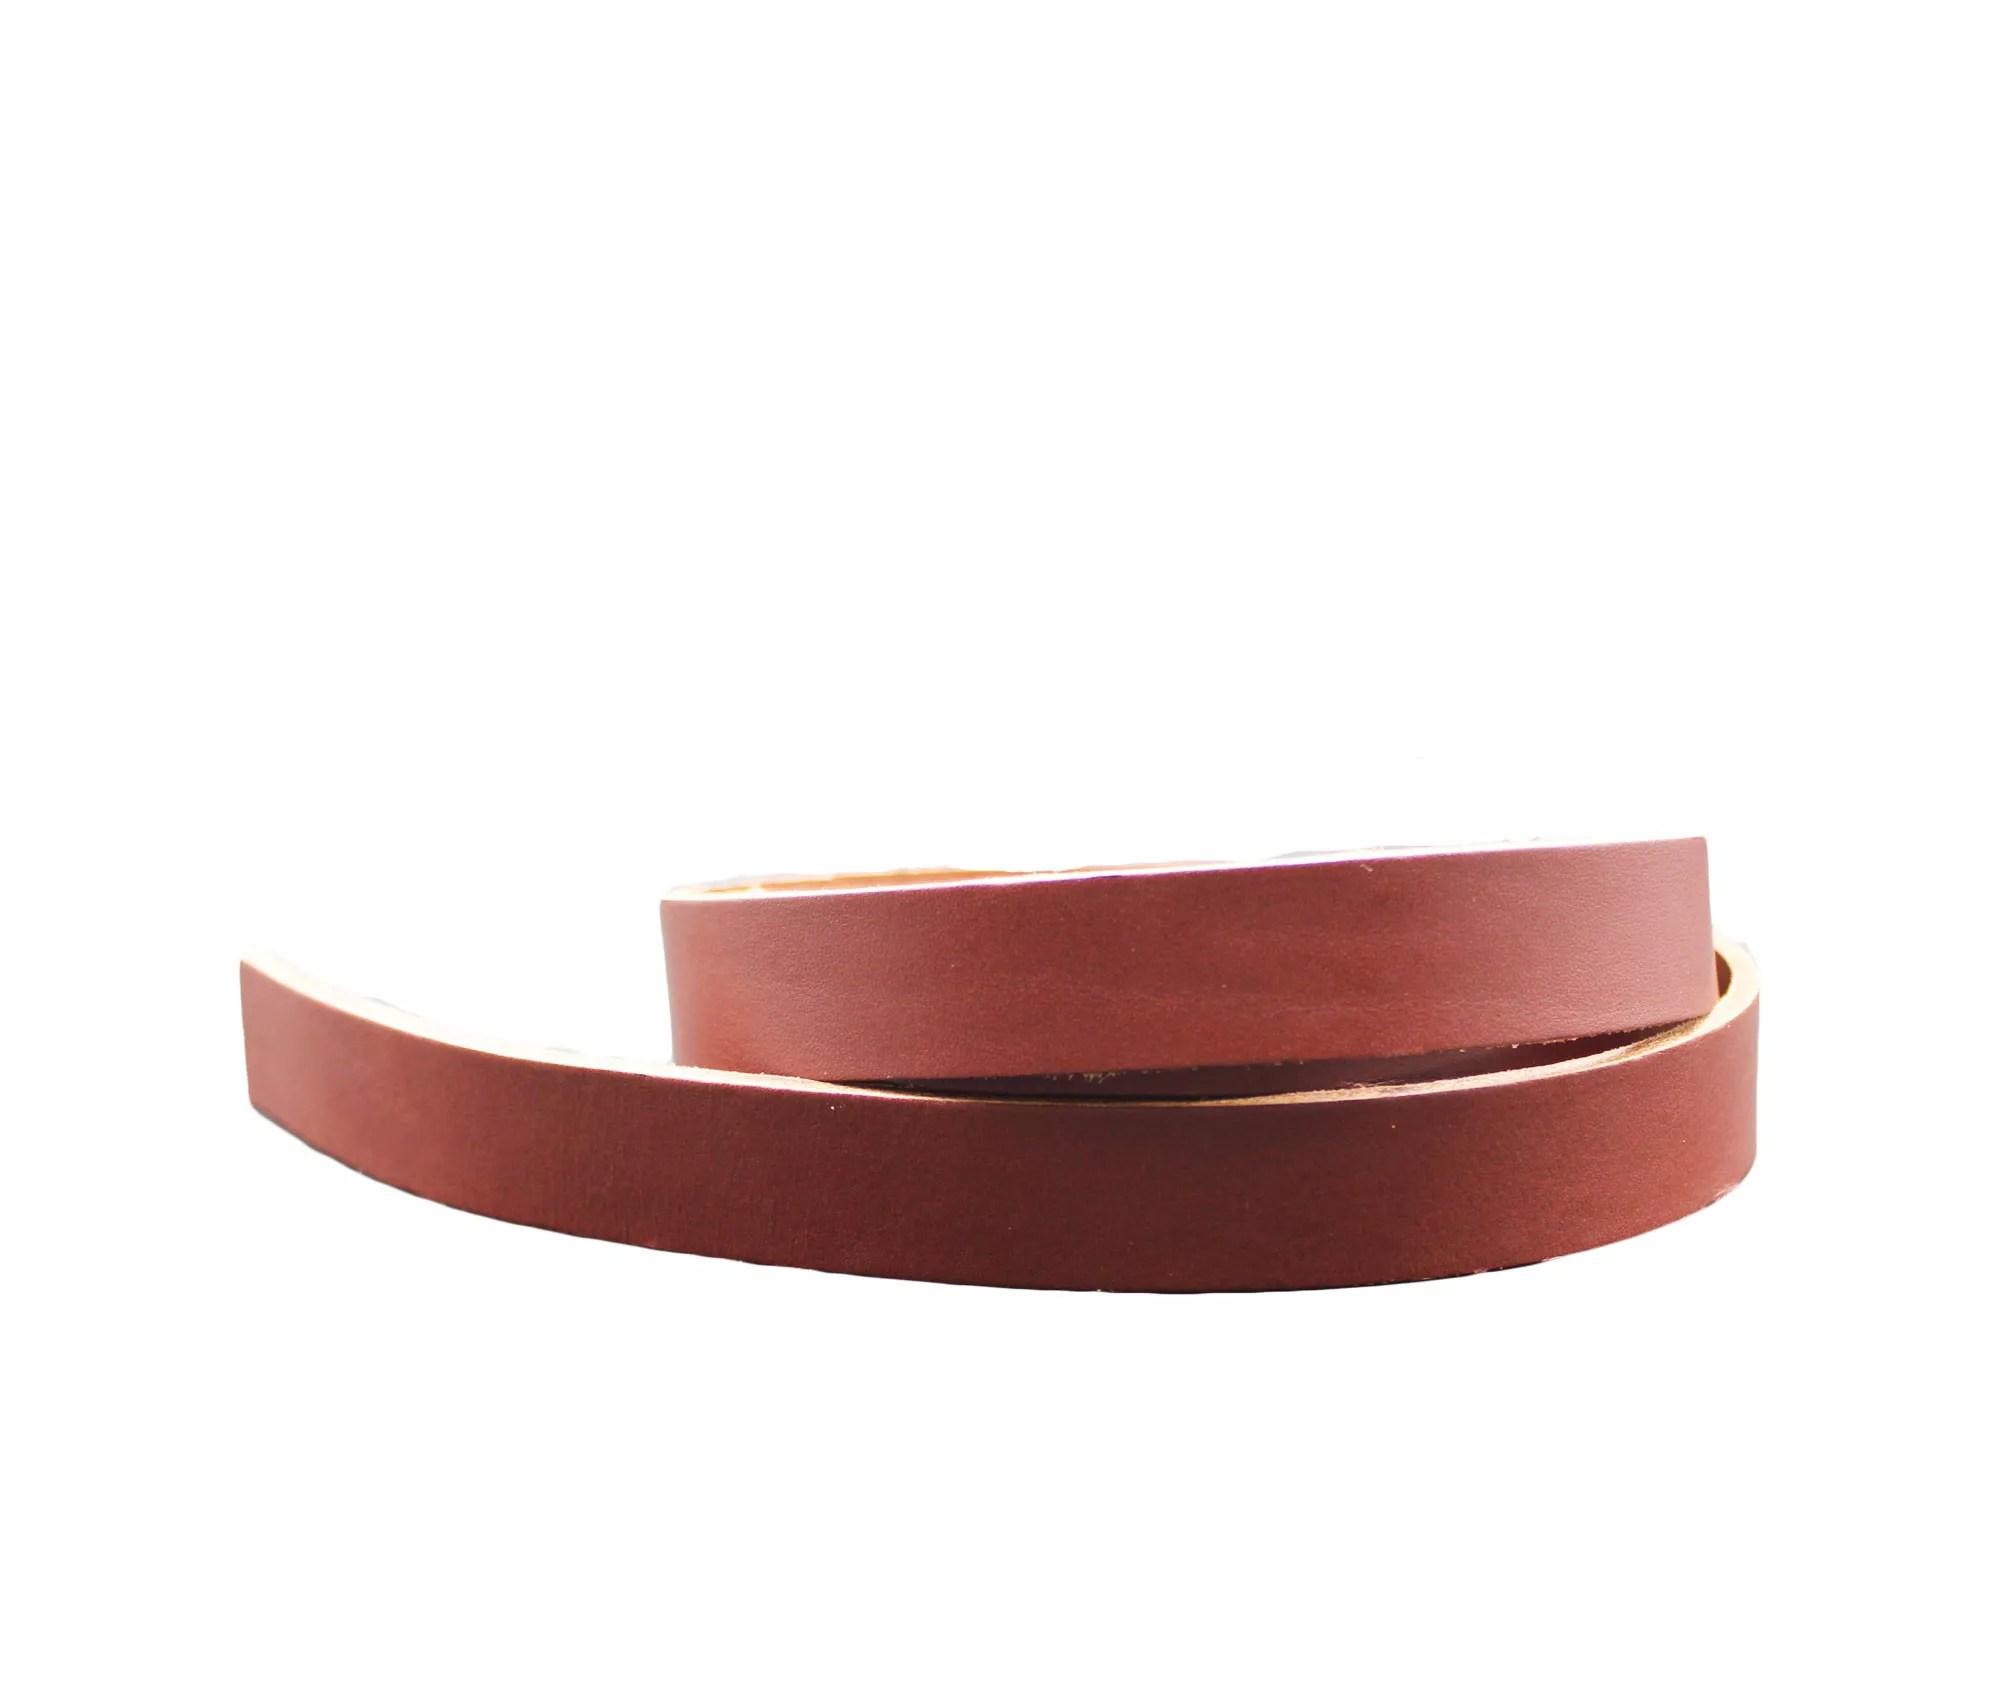 sangle en cuir 123 x 1 5 cm marron havane tannage vegetal 3 0 3 5 mm